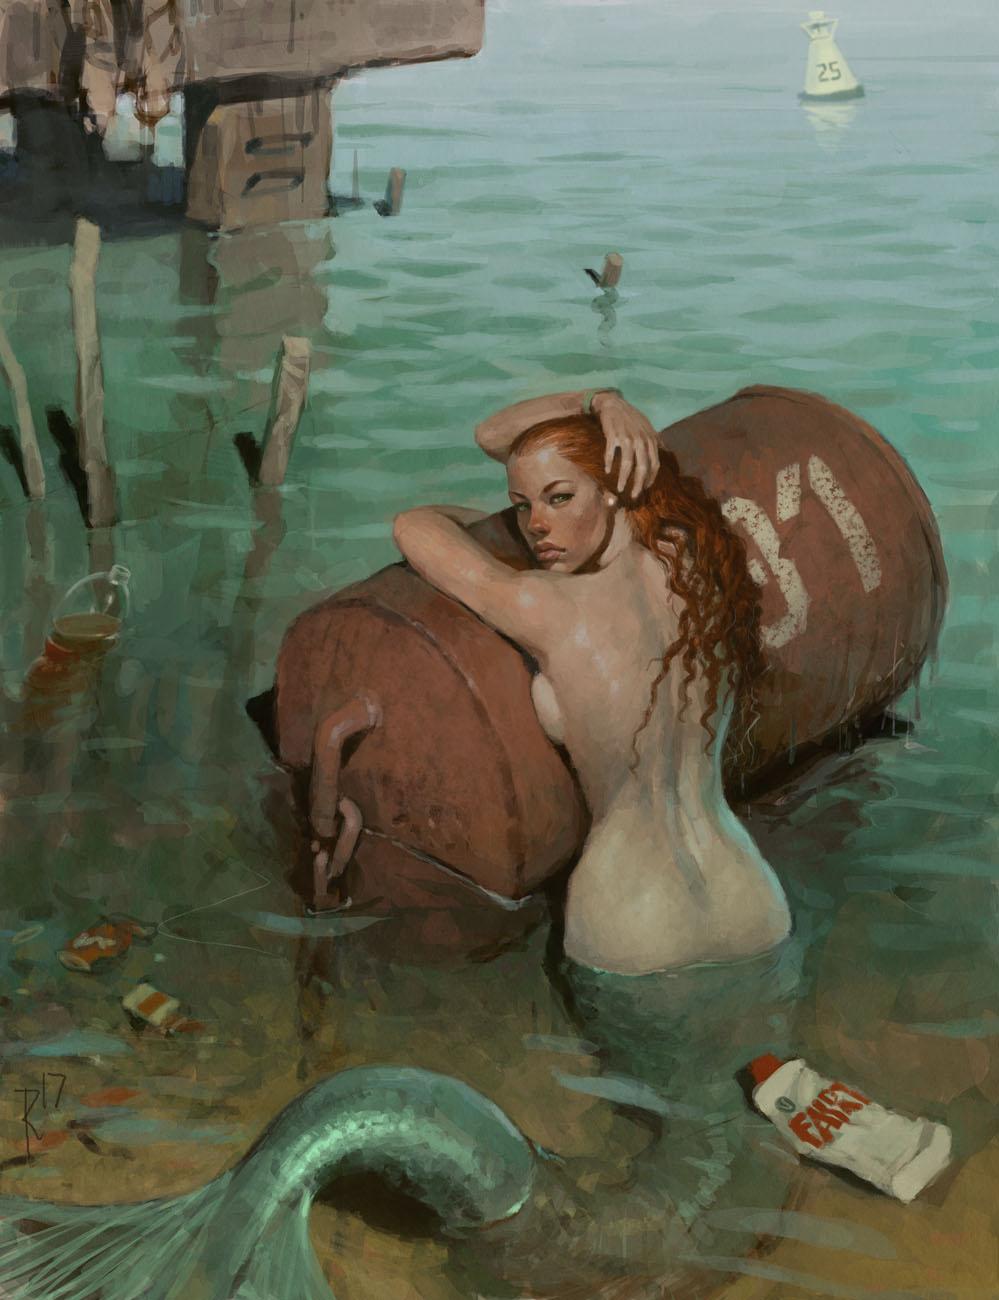 mermaid2017_by_waldemar_kazak-db8k6bf.jpg